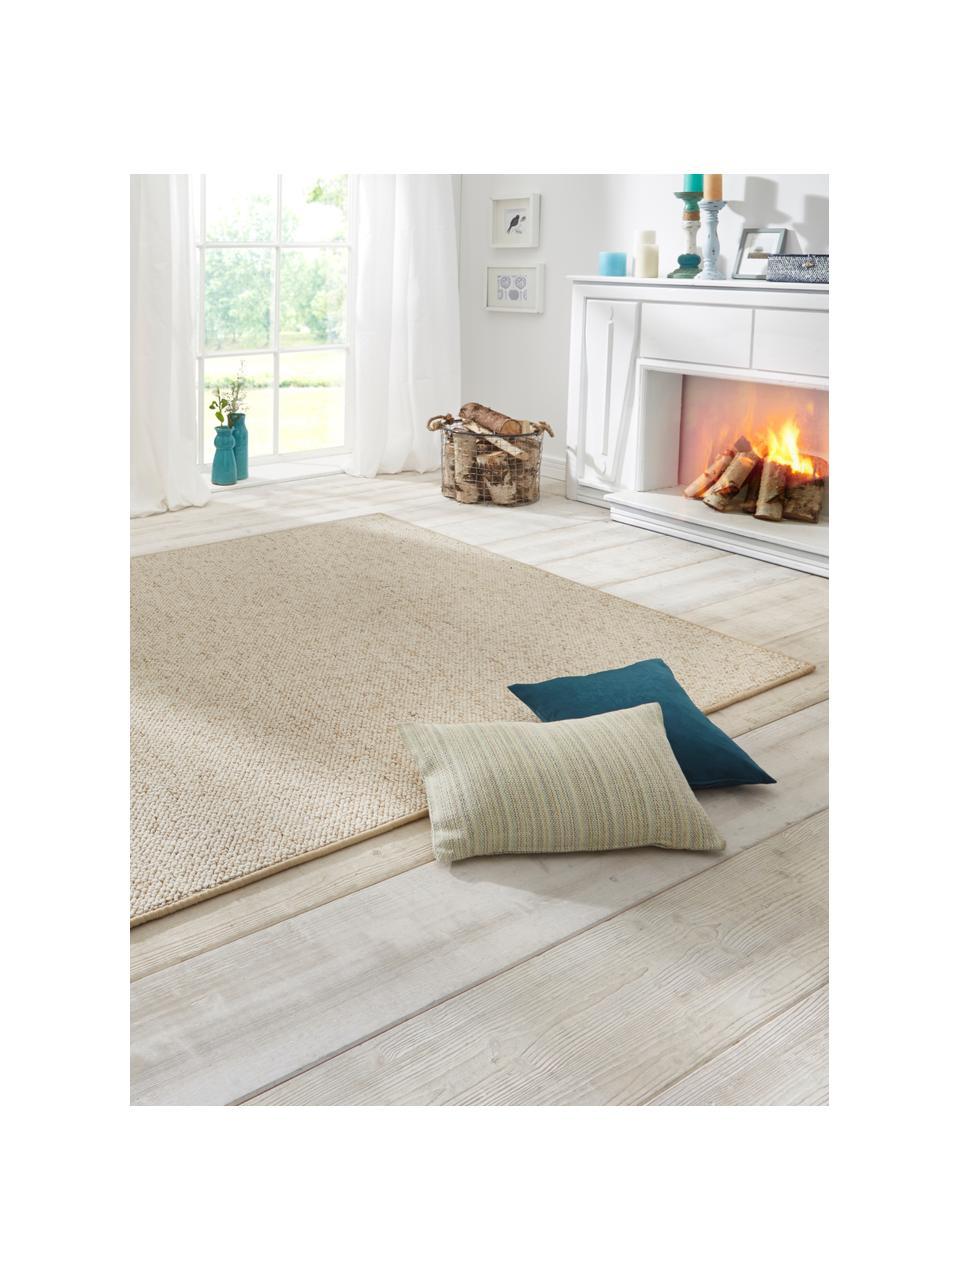 Teppich Lyon mit Schlingen-Flor, Flor: 100% Polypropylen Rücken, Creme, melangiert, B 200 x L 300 cm (Größe L)